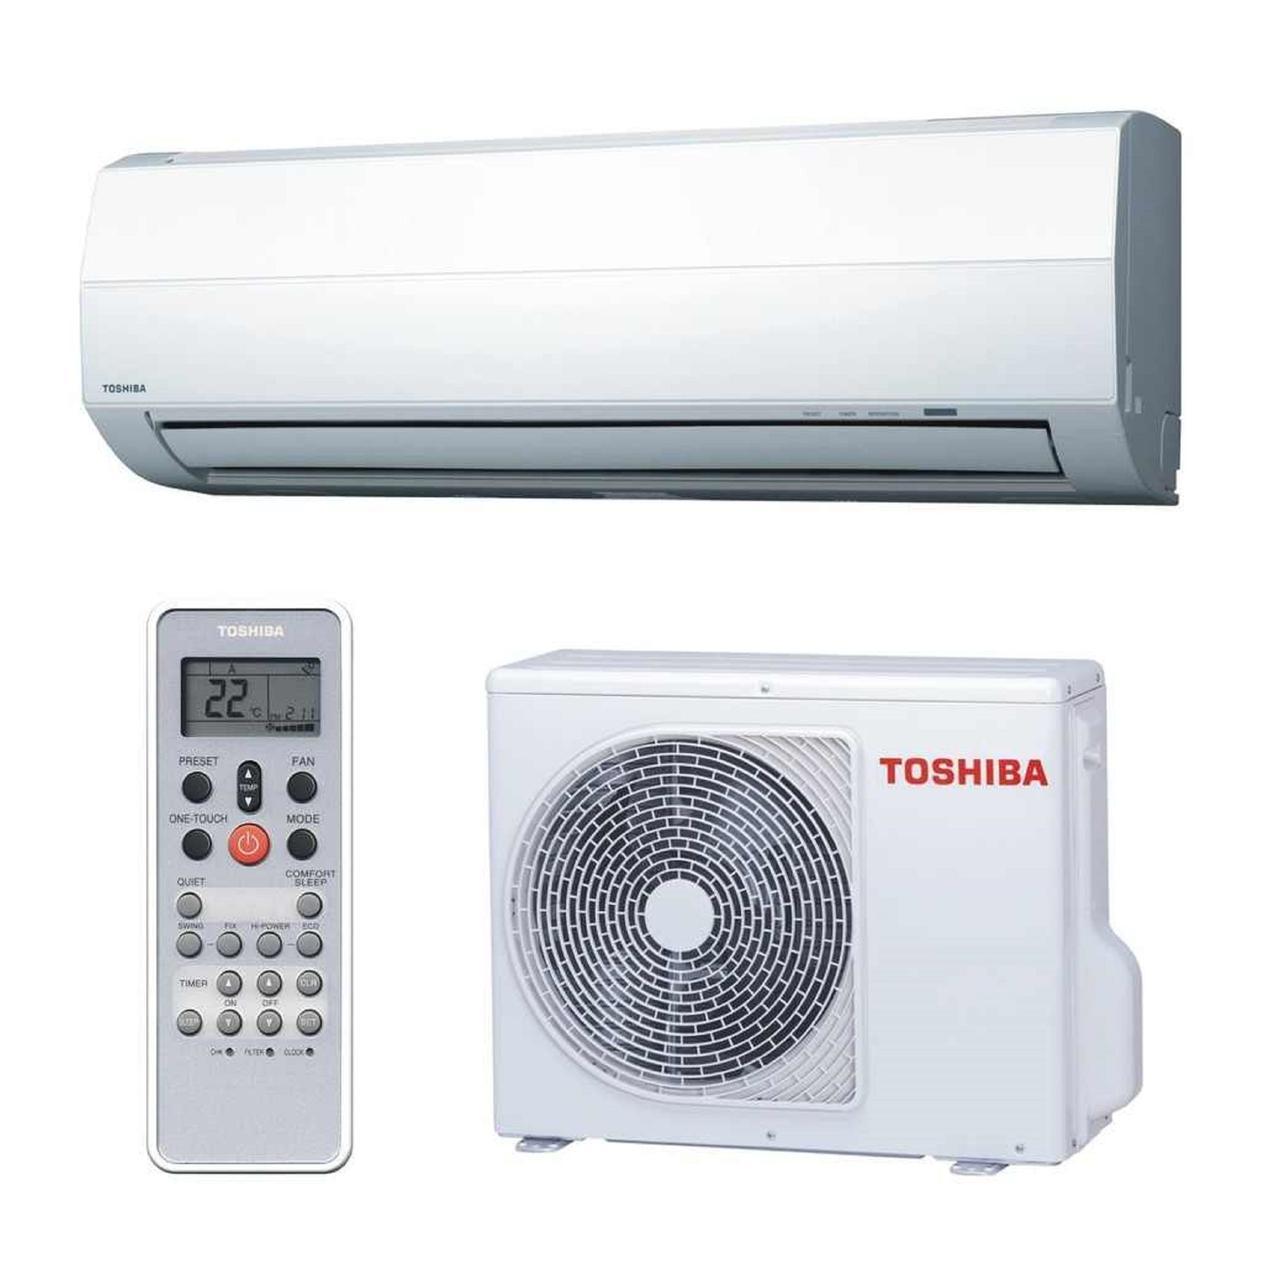 Инверторный кондиционер Toshiba до 20 кв.м RAS-07EKV-EE/RAS-07EAV-EE